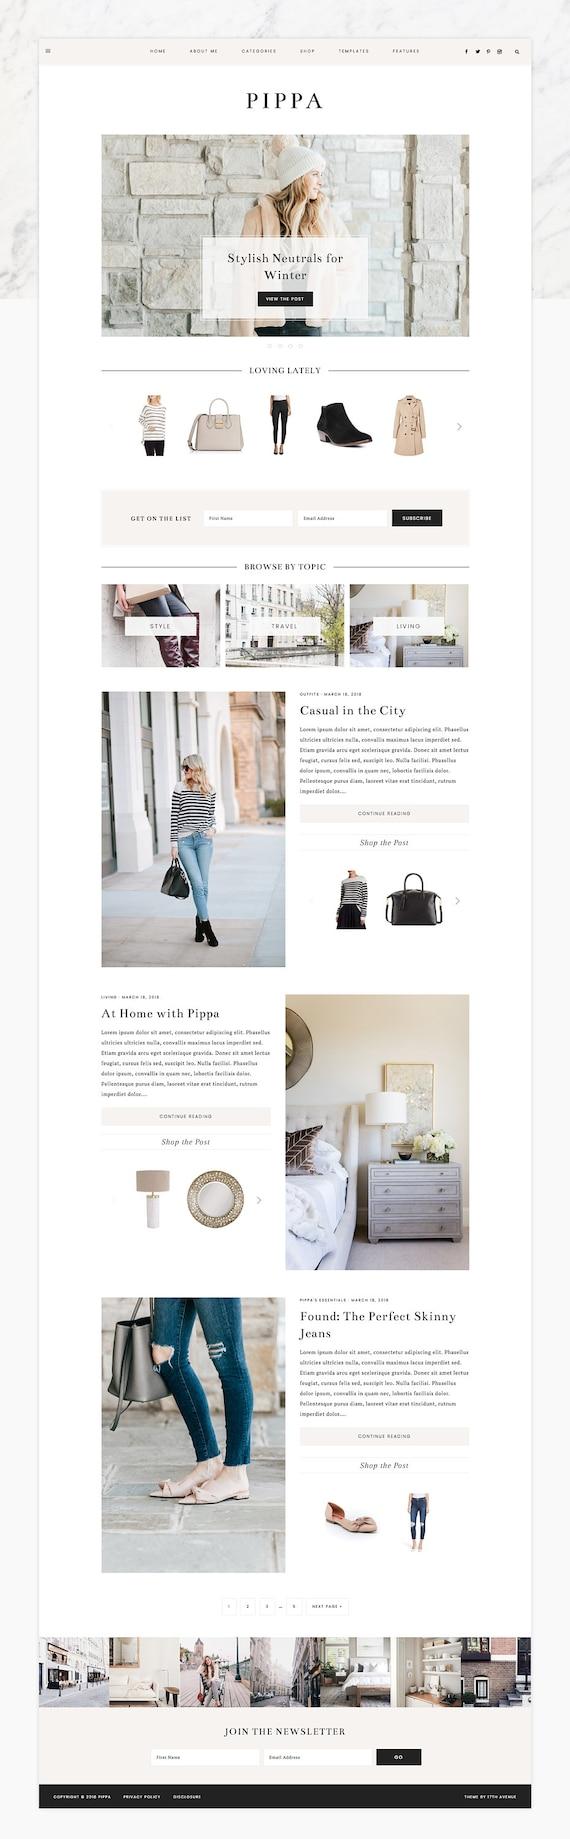 "NEW Wordpress Theme - Wordpress Ecommerce Theme - Fashion Theme - Genesis Theme - ""Pippa"" Instant Digital Download"